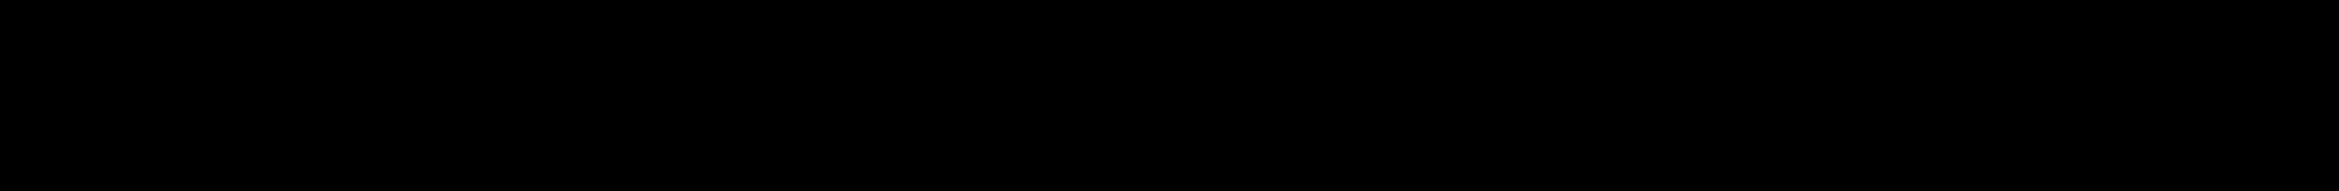 YWFT Ultramagnetic Light